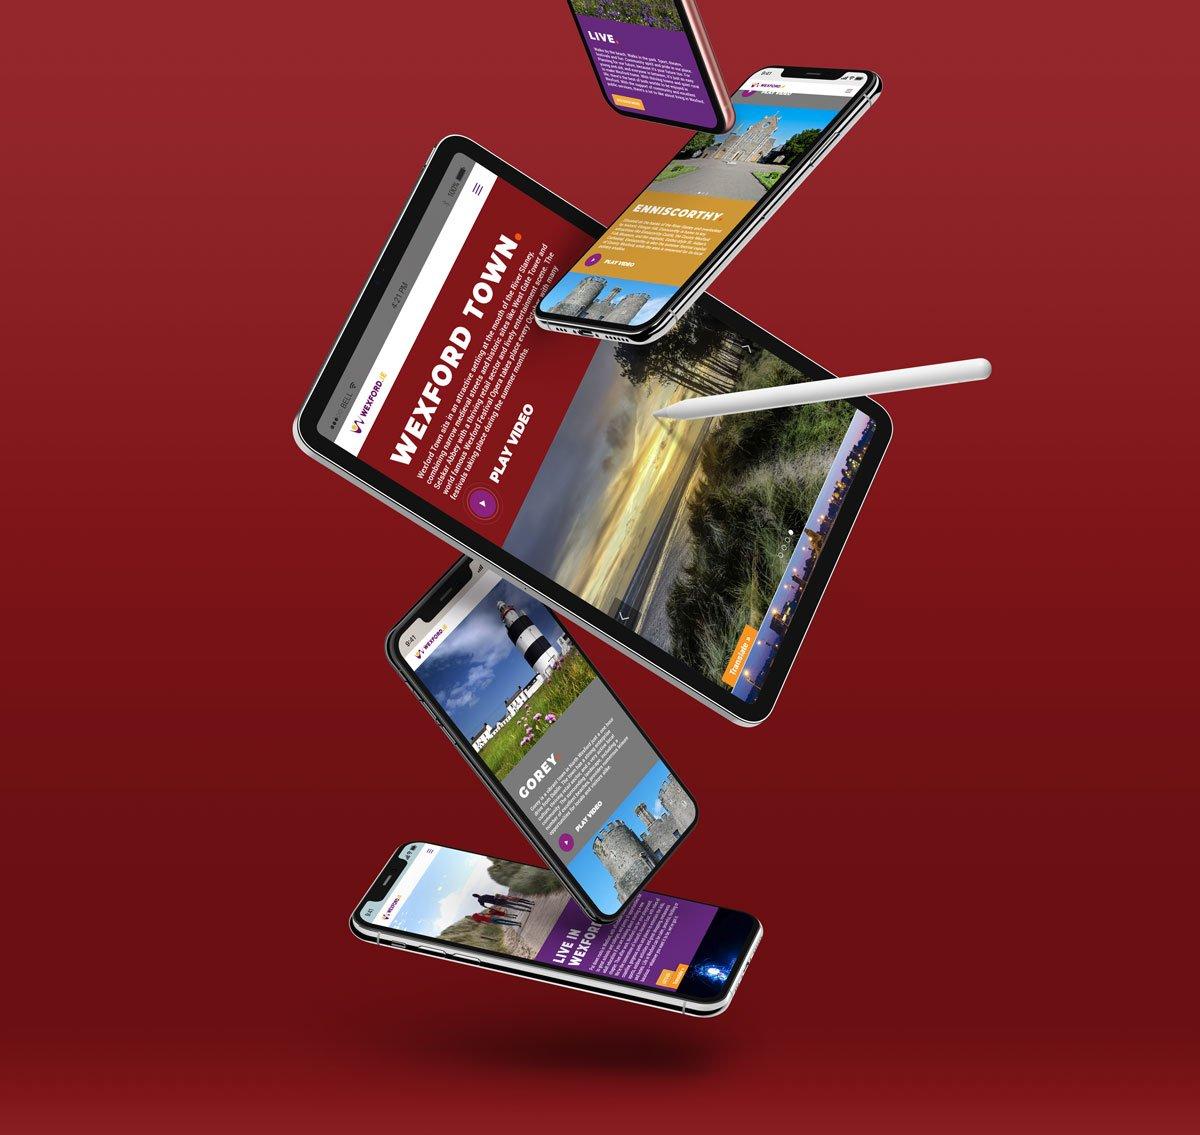 ipad iphone wexford website design